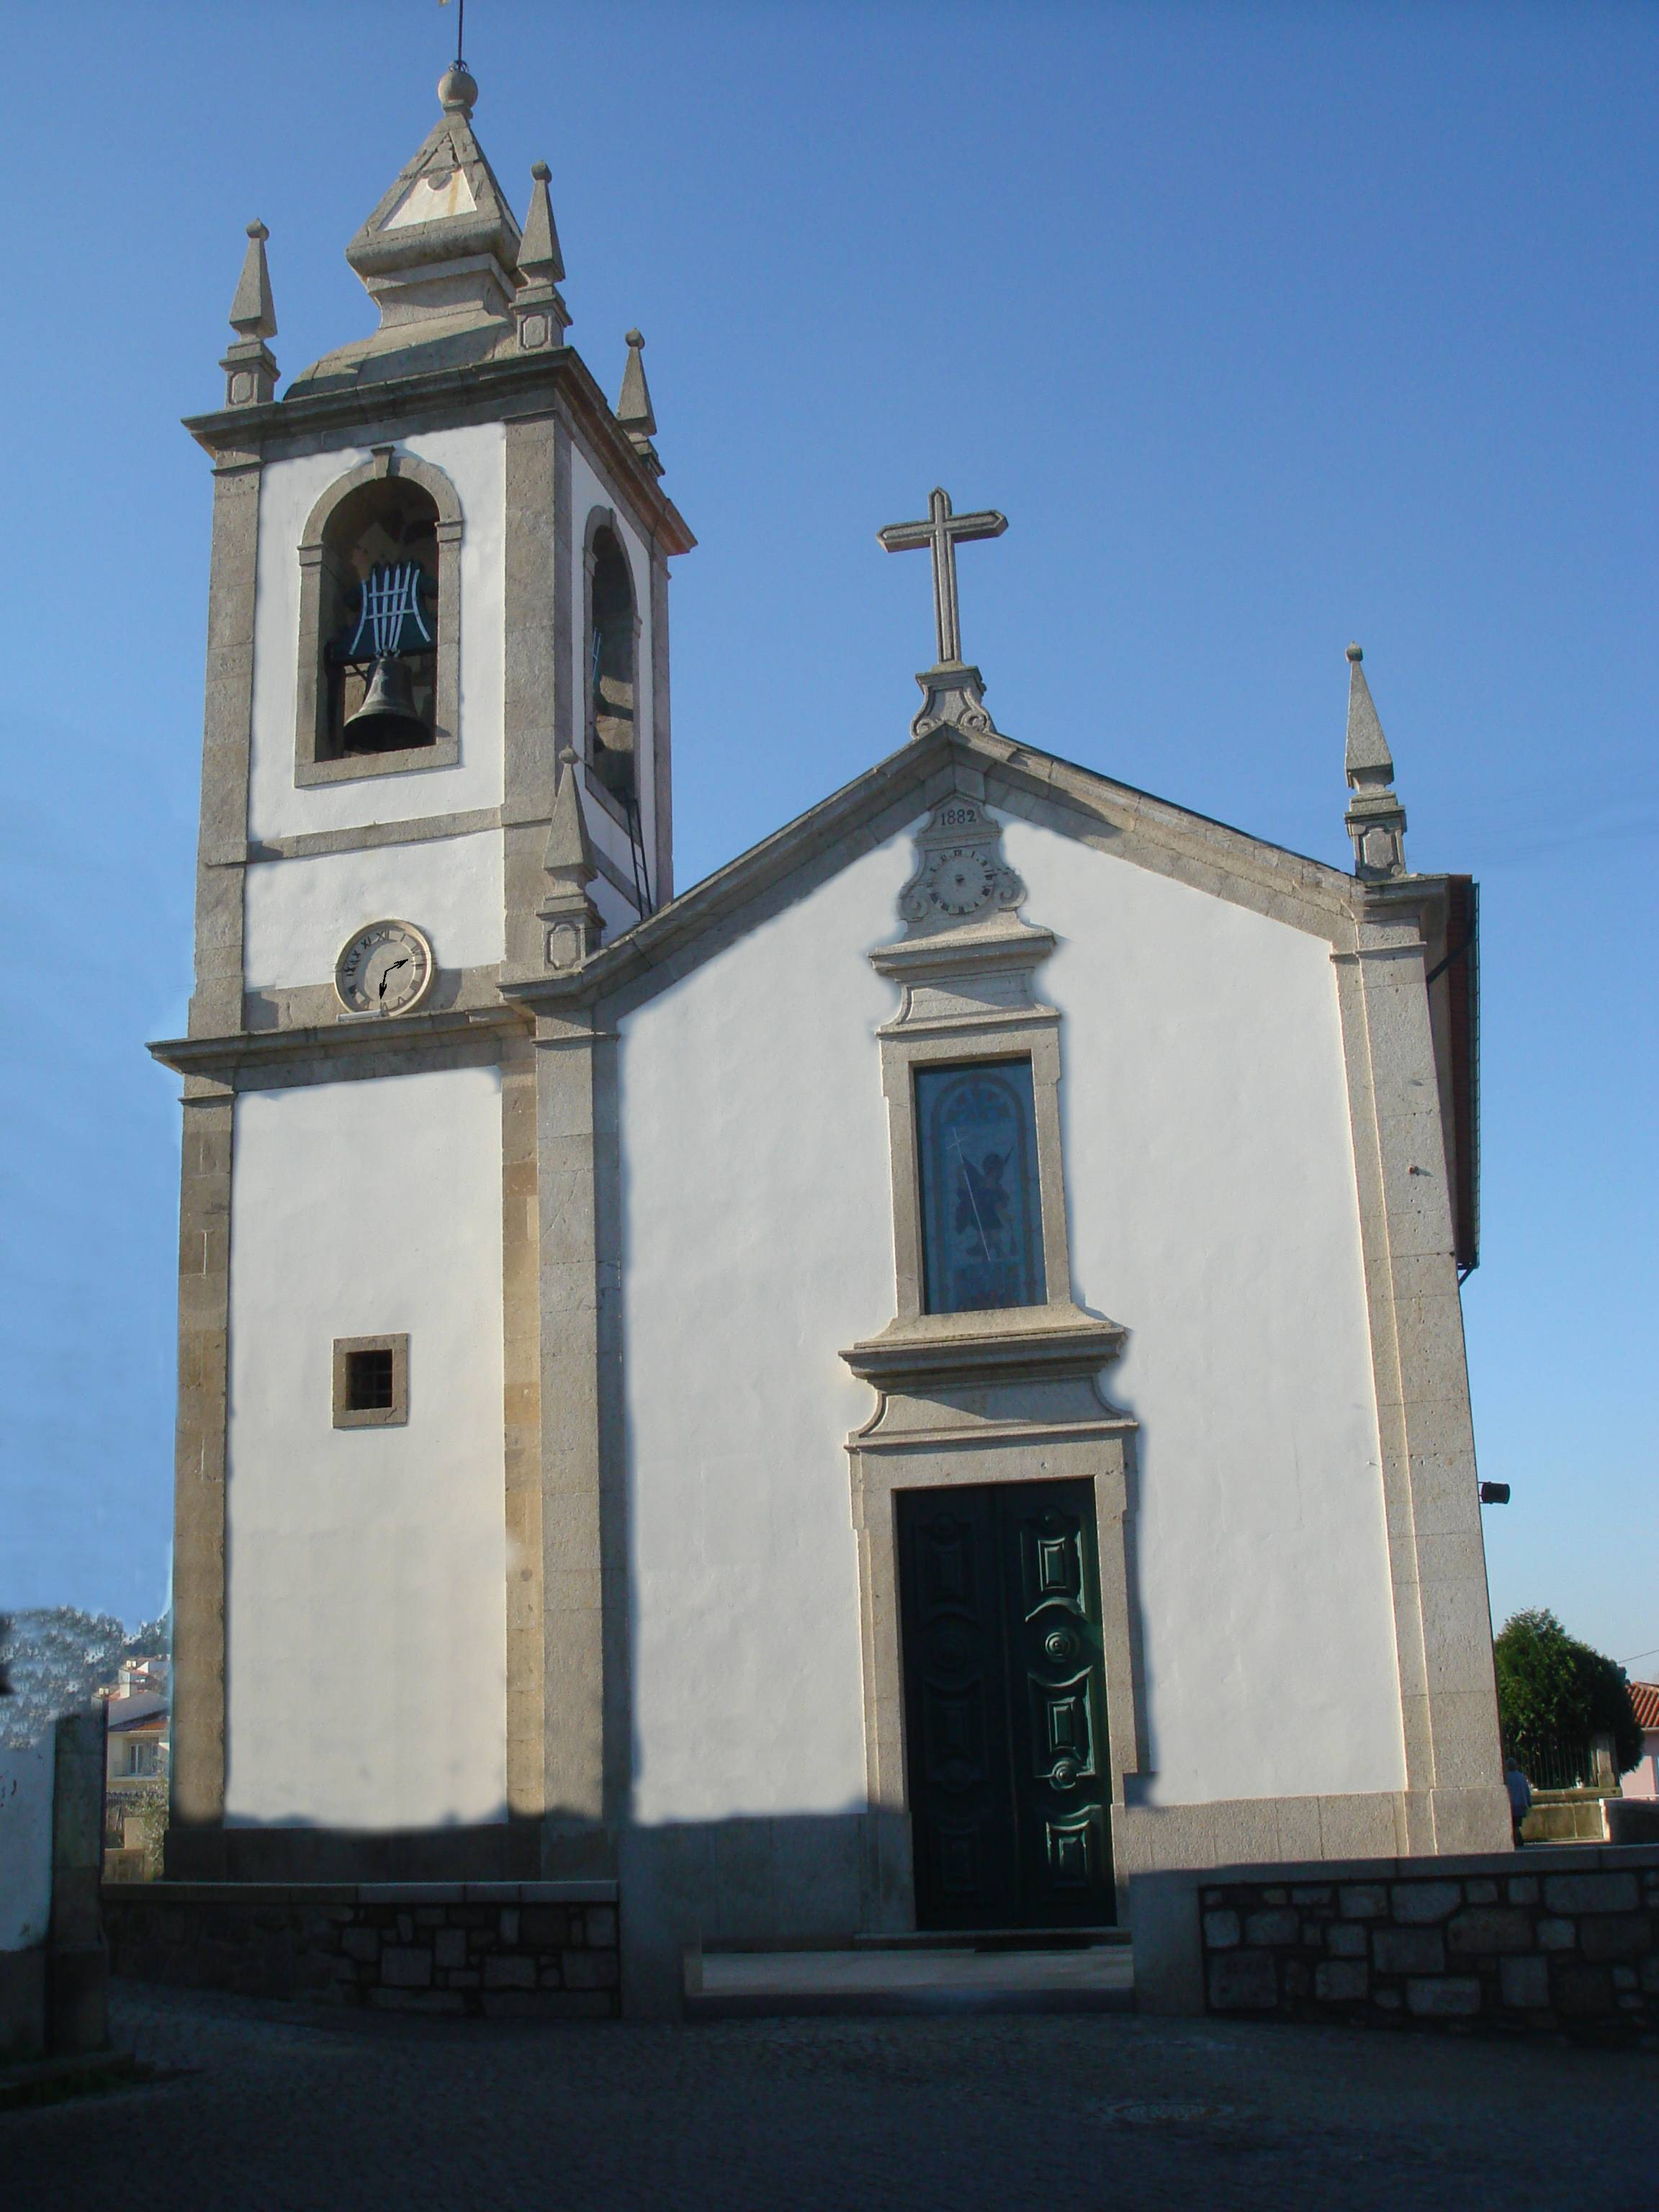 https://i1.wp.com/upload.wikimedia.org/wikipedia/commons/3/37/Igreja_Frossos_Braga.JPG